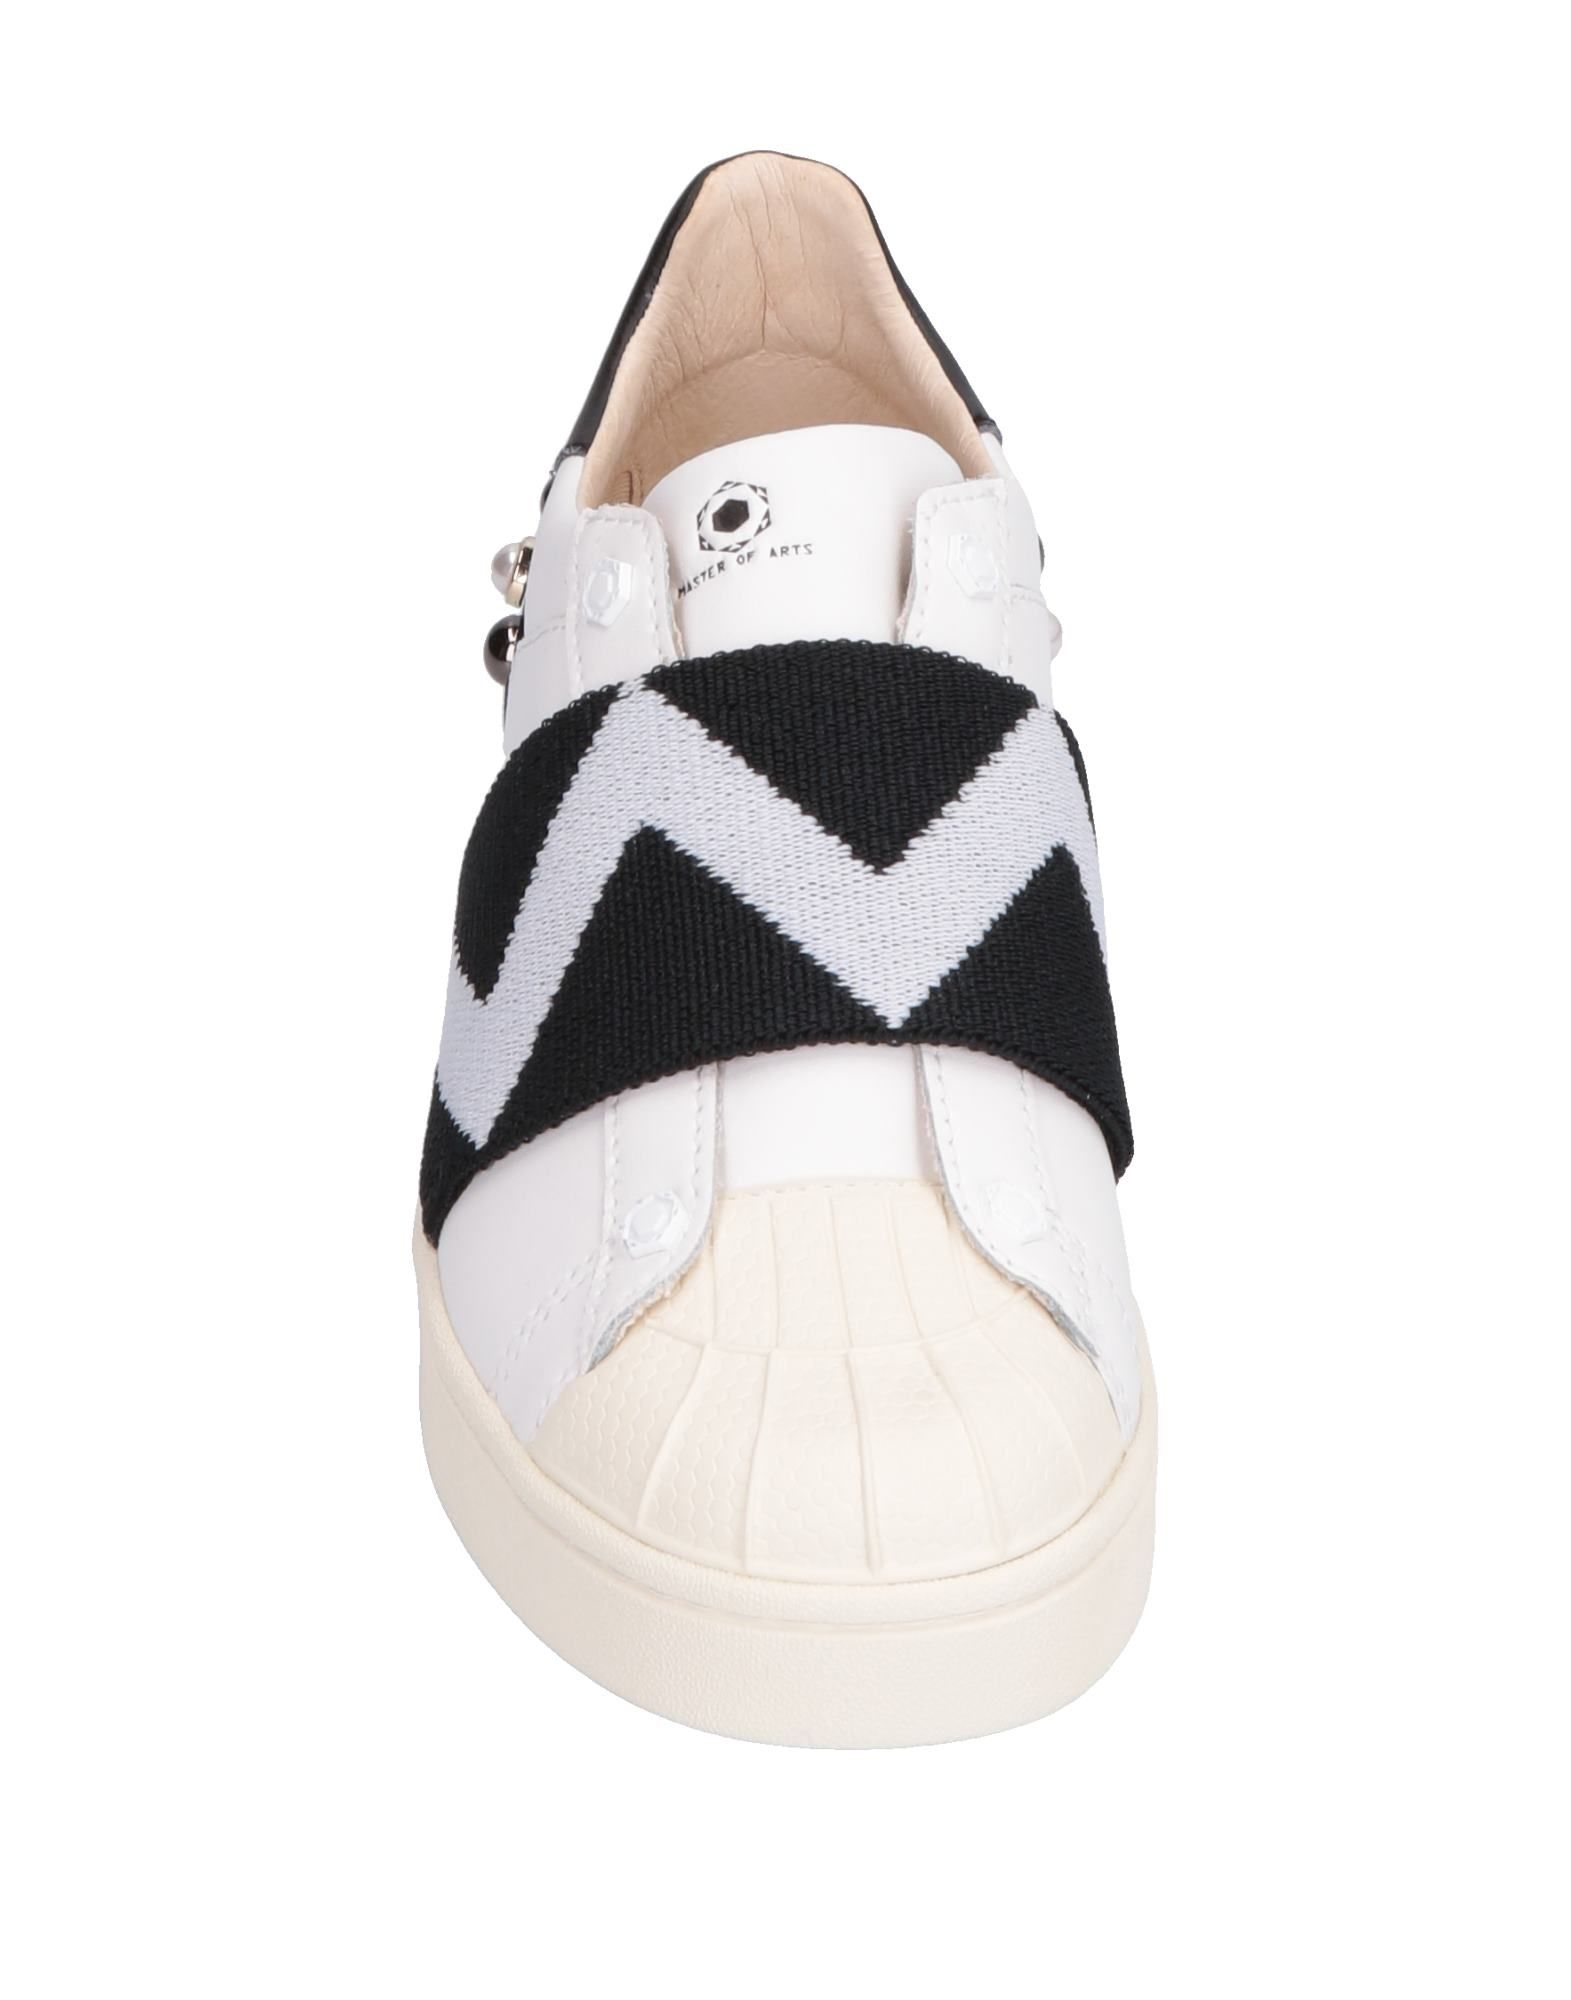 Stilvolle Arts billige Schuhe Moa Master Of Arts Stilvolle Sneakers Damen  11580372IL b4be7c